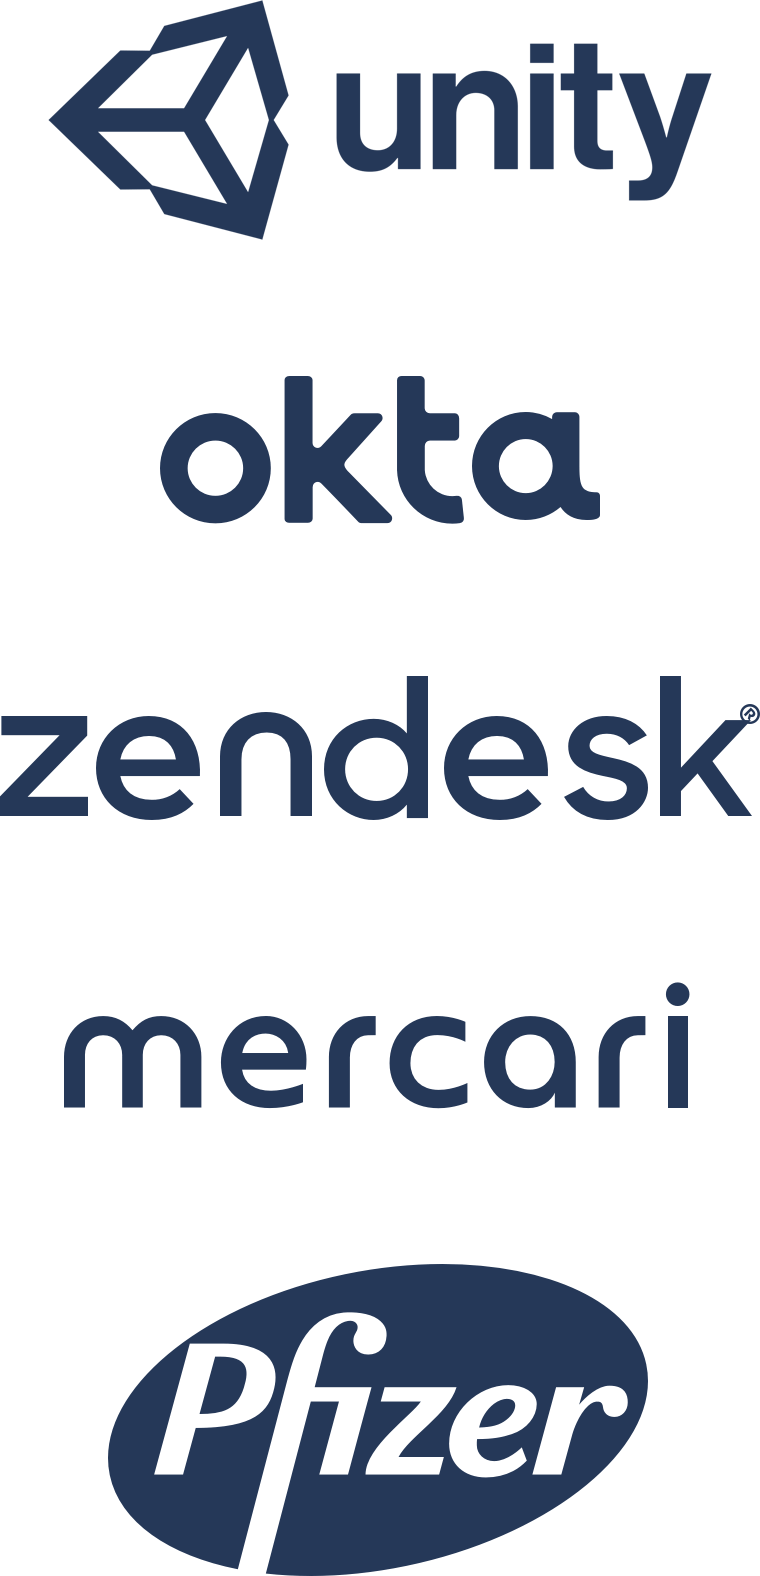 Логотипы Unity, Okta, Zendesk, Mercari, Pfizer